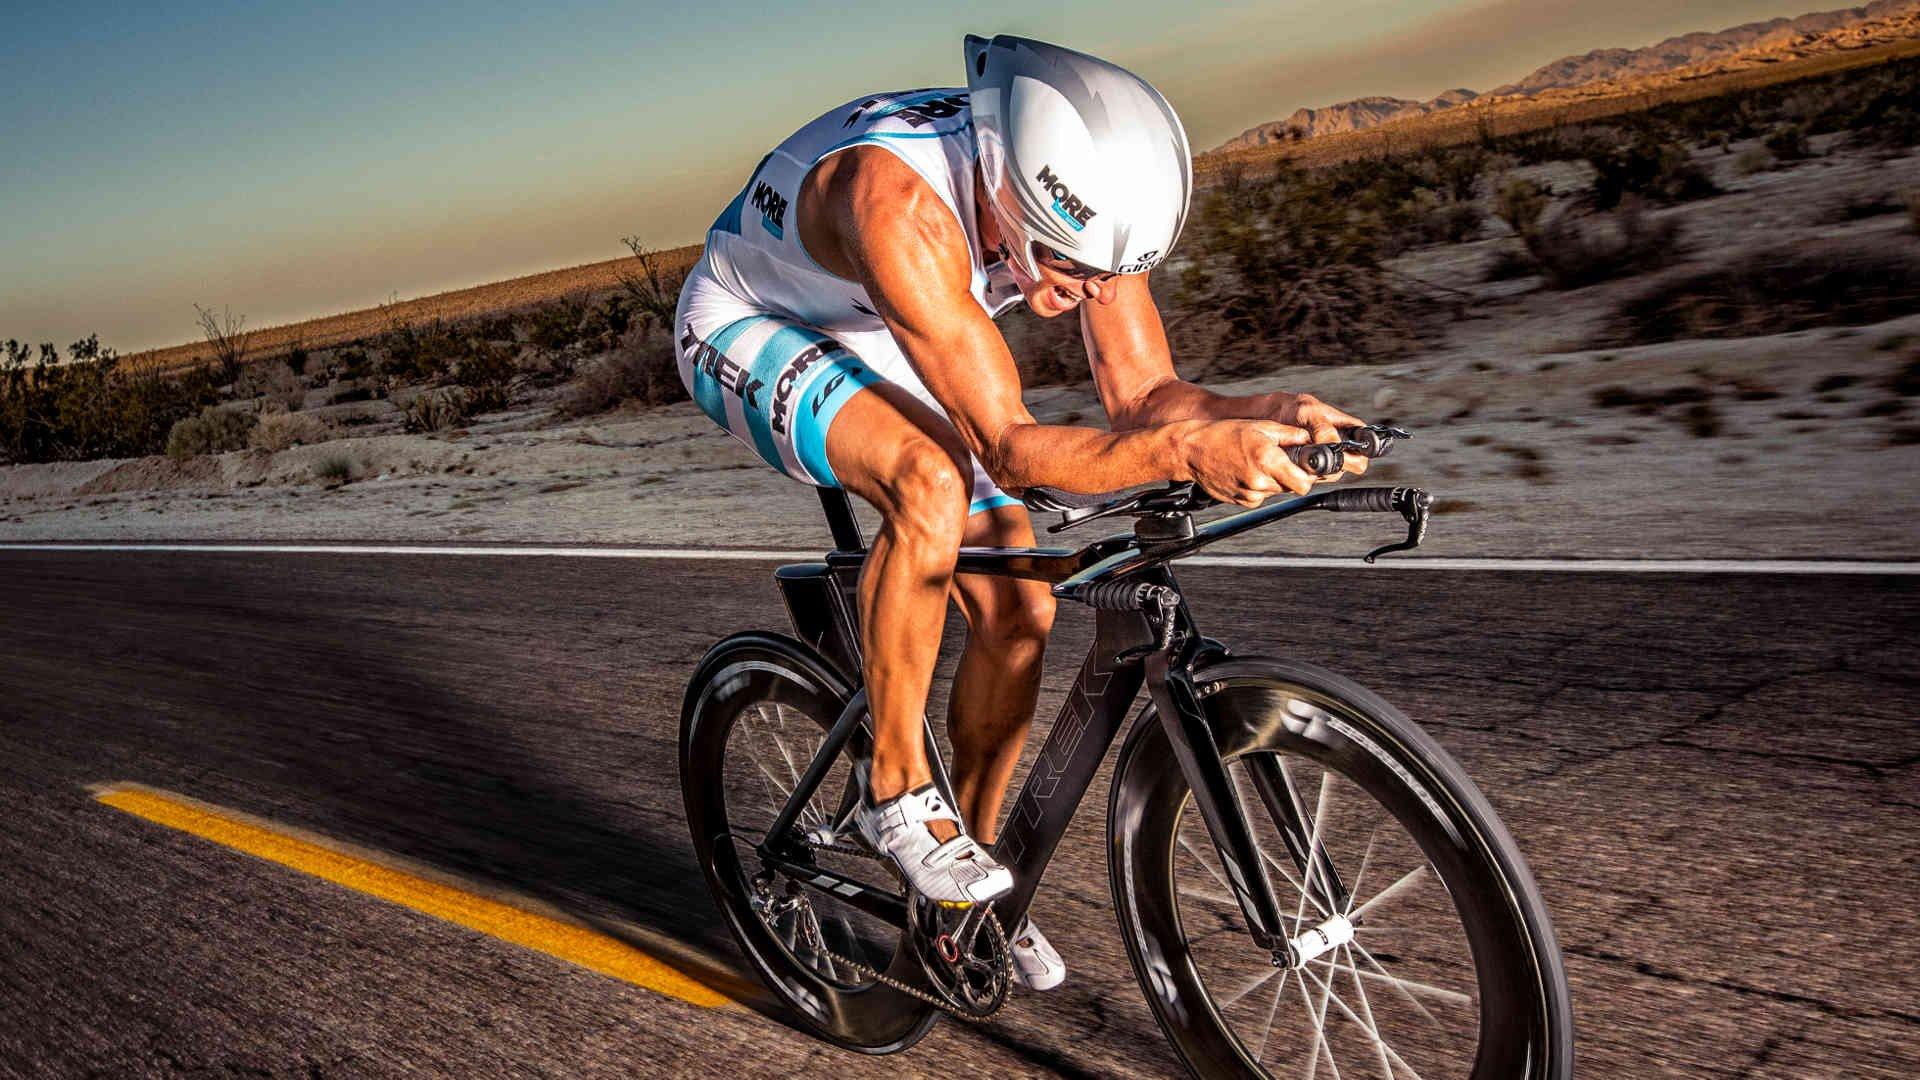 TREK bicycle bike wallpaper | 1920x1080 | 460745 | WallpaperUP